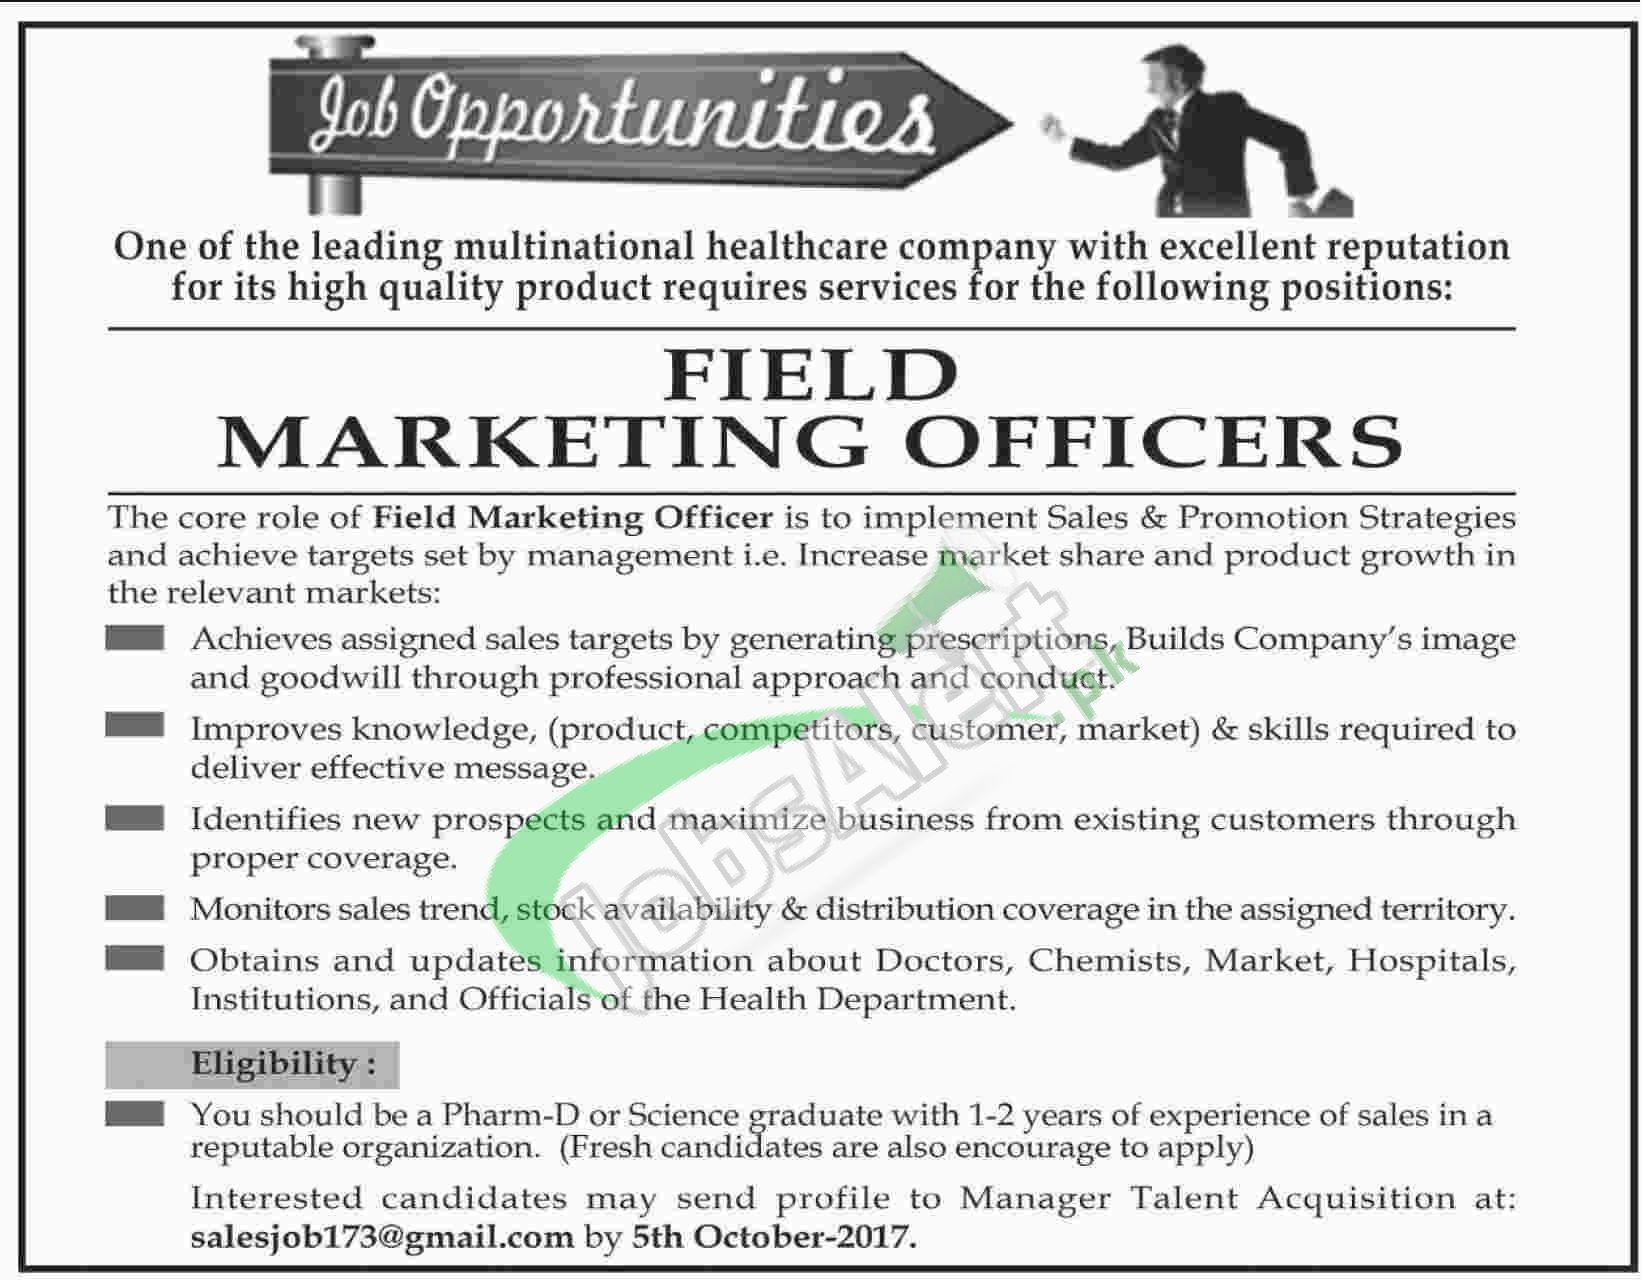 Multinational Healthcare Company